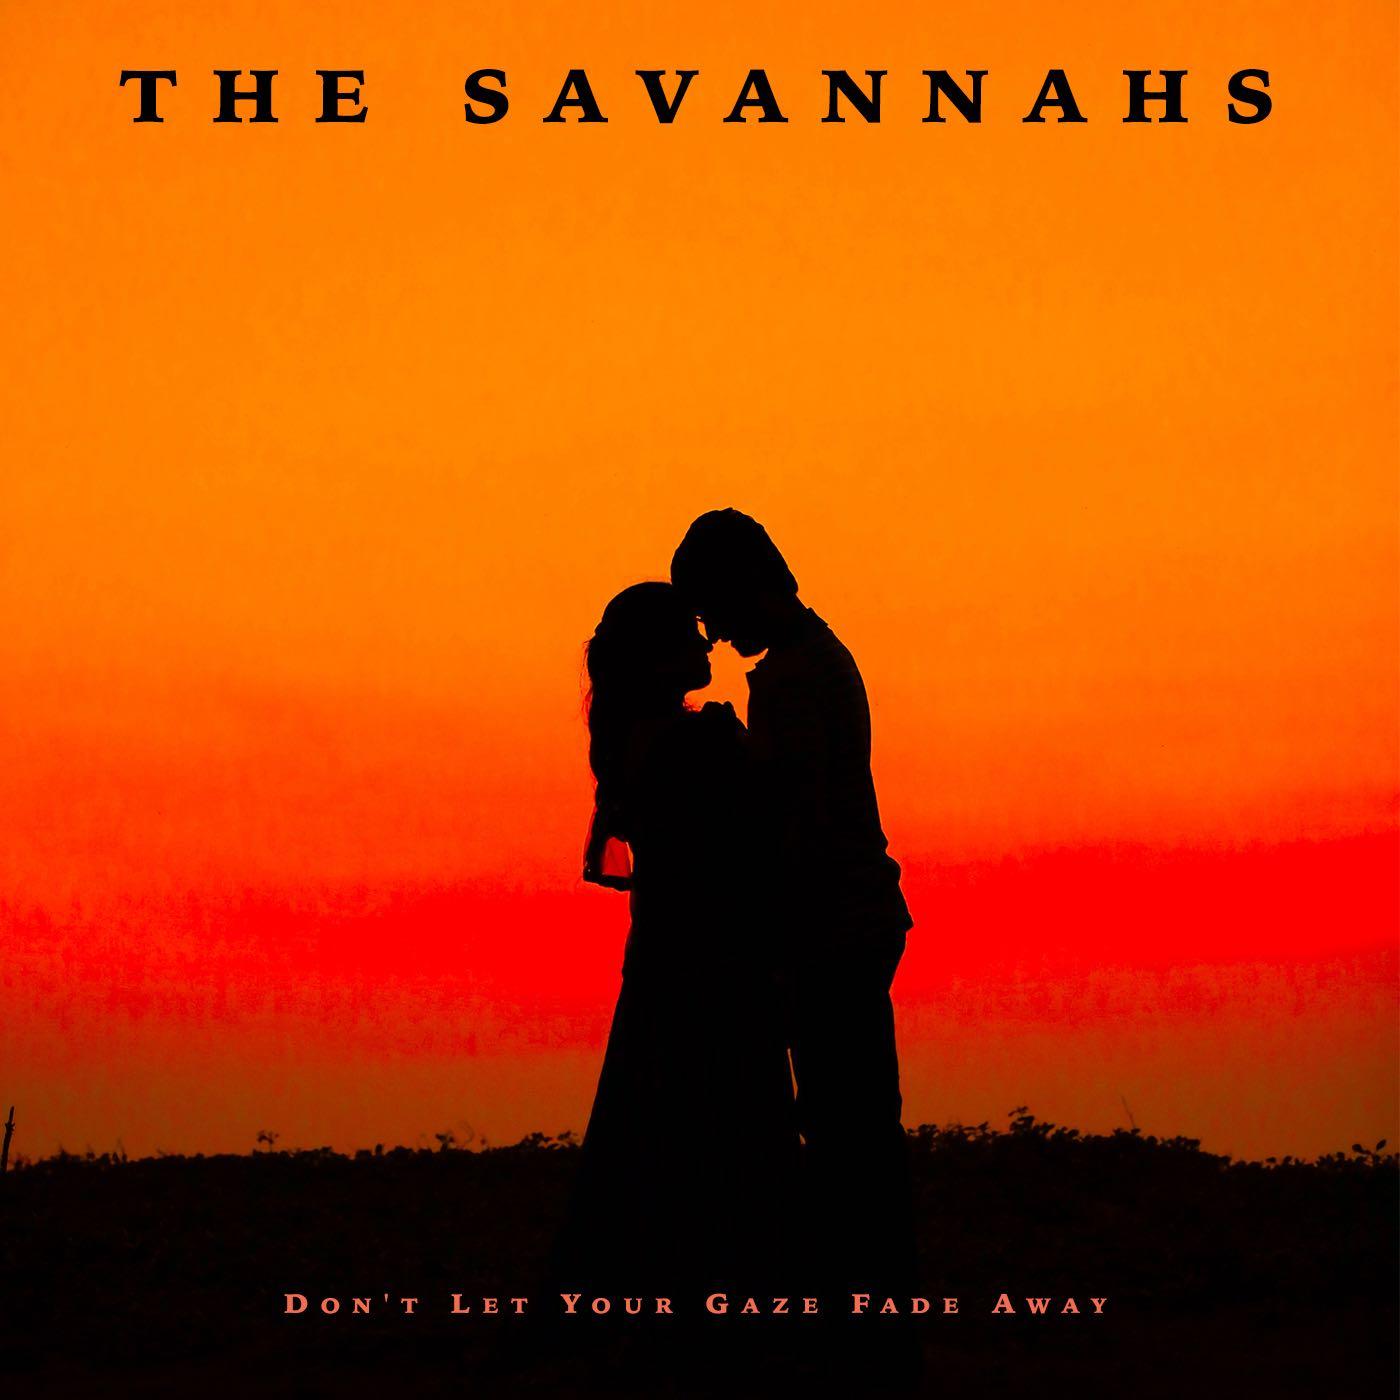 Dont-Let-Your-Gaze-Fade-Away-Savannahs